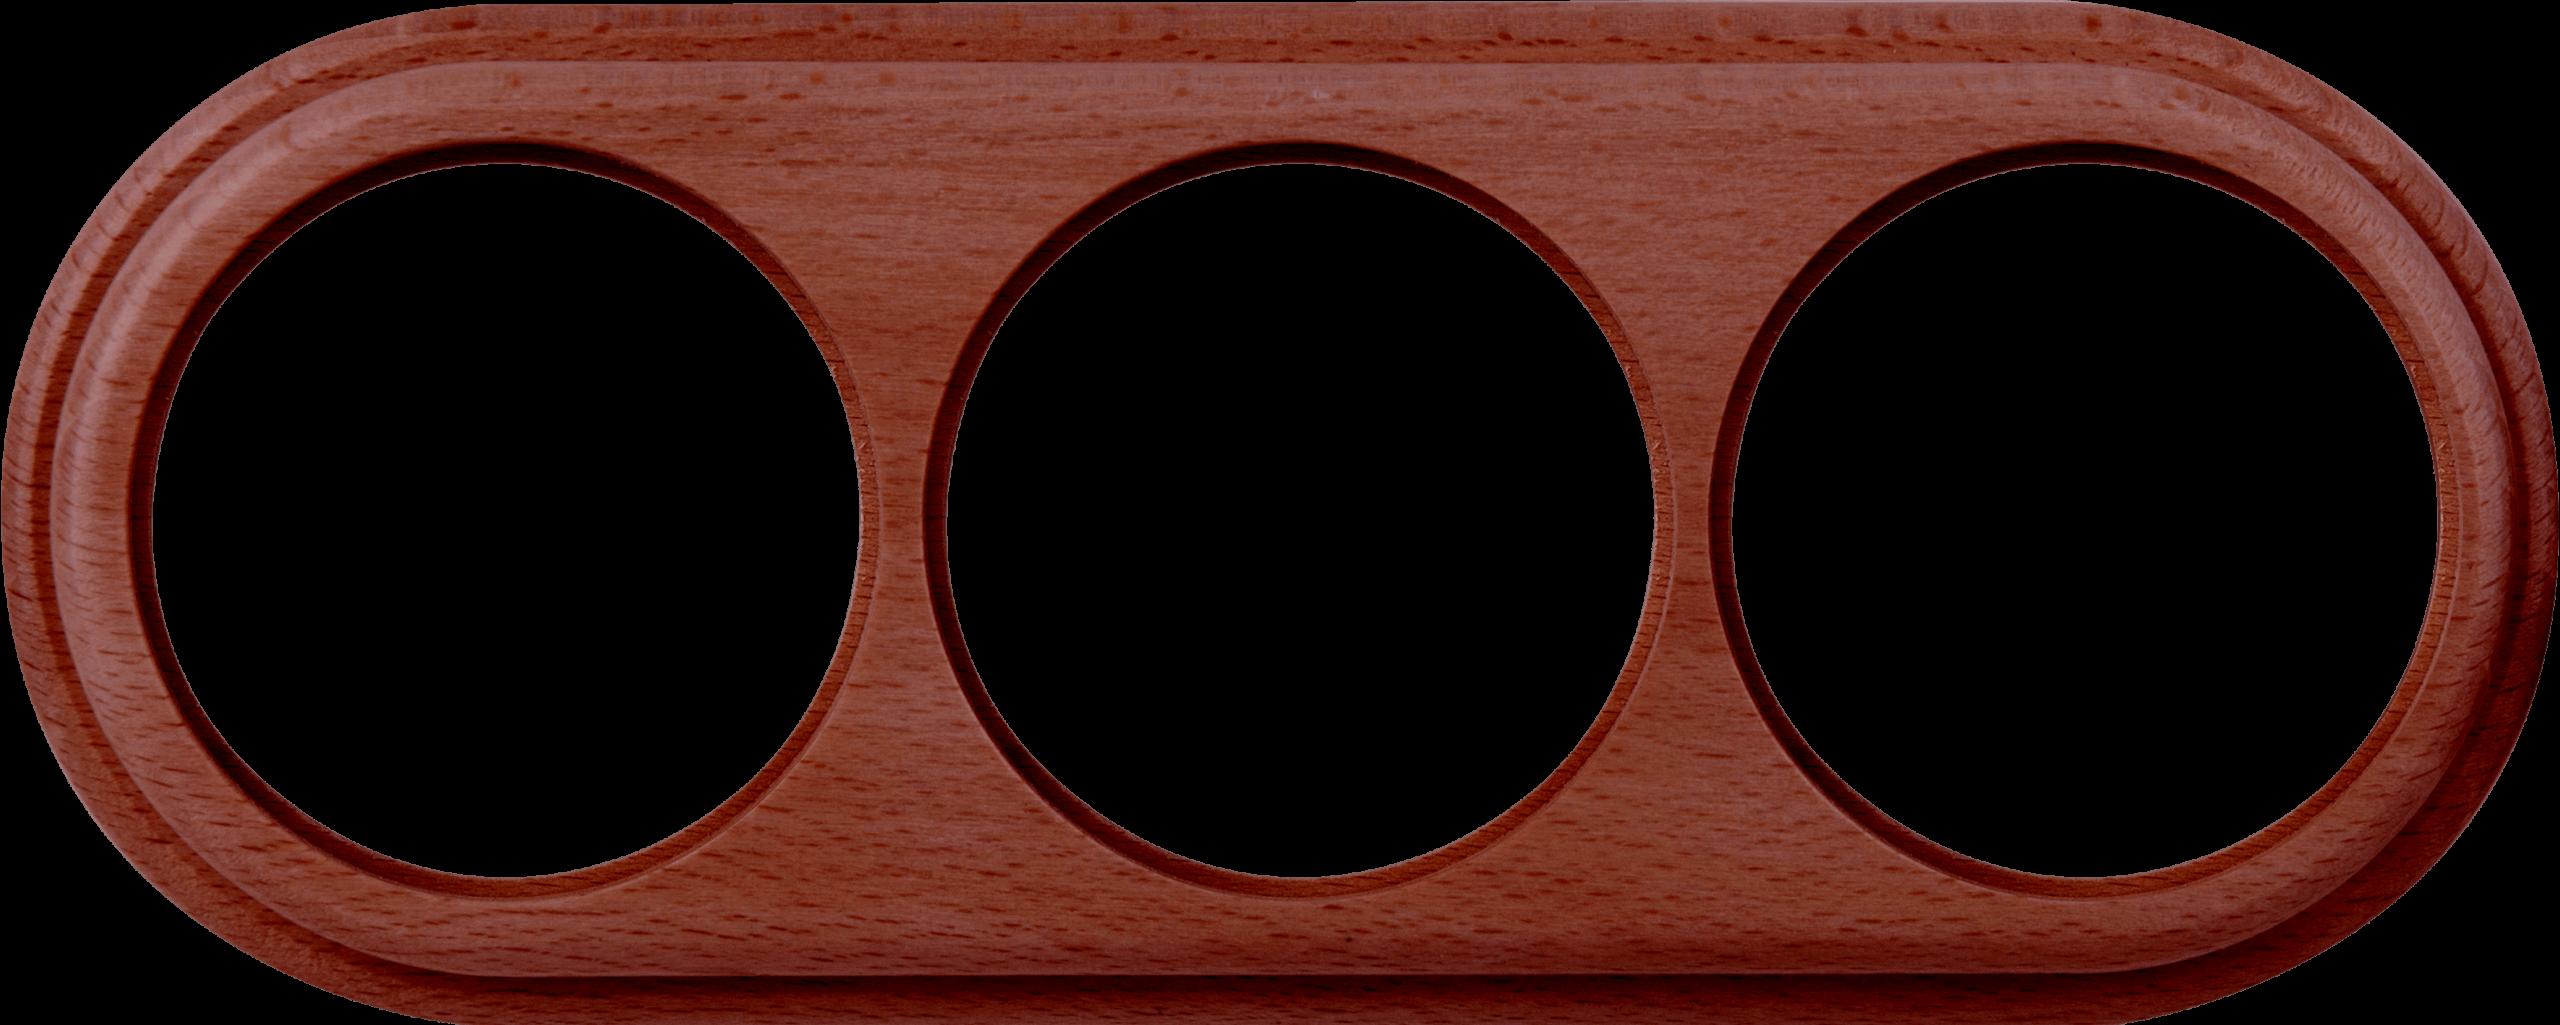 WL15-frame-03 /  Рамка на 3 поста (итальянский орех)